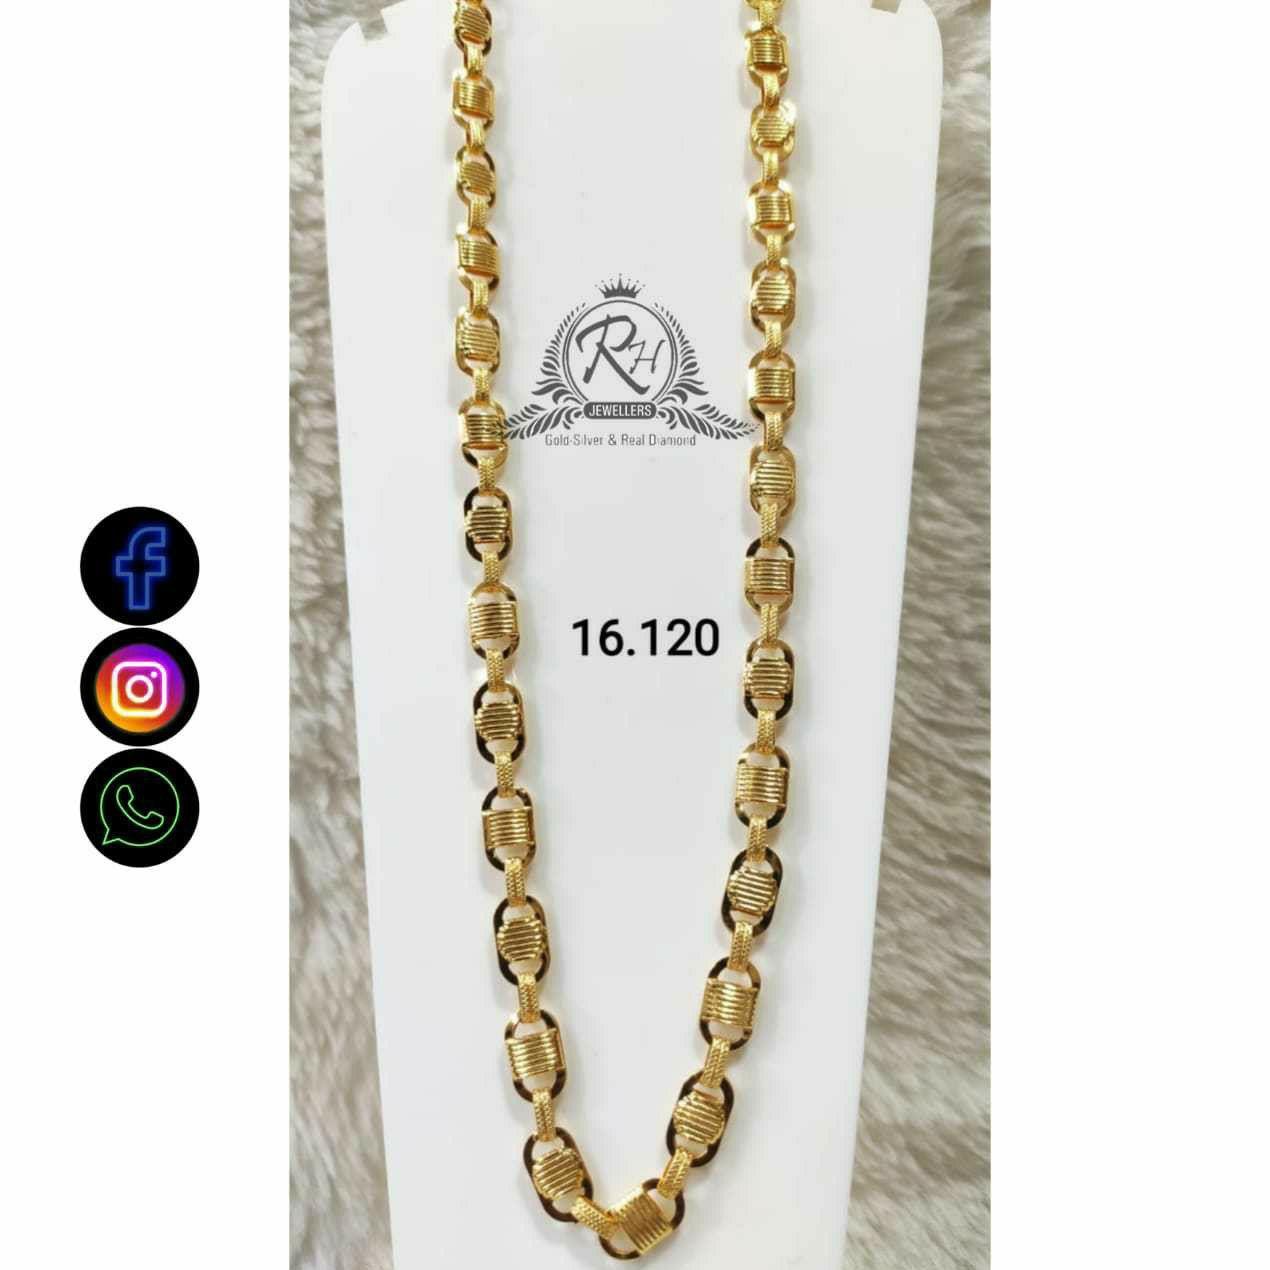 22 Carat Gold Gents Chain RH-CH770